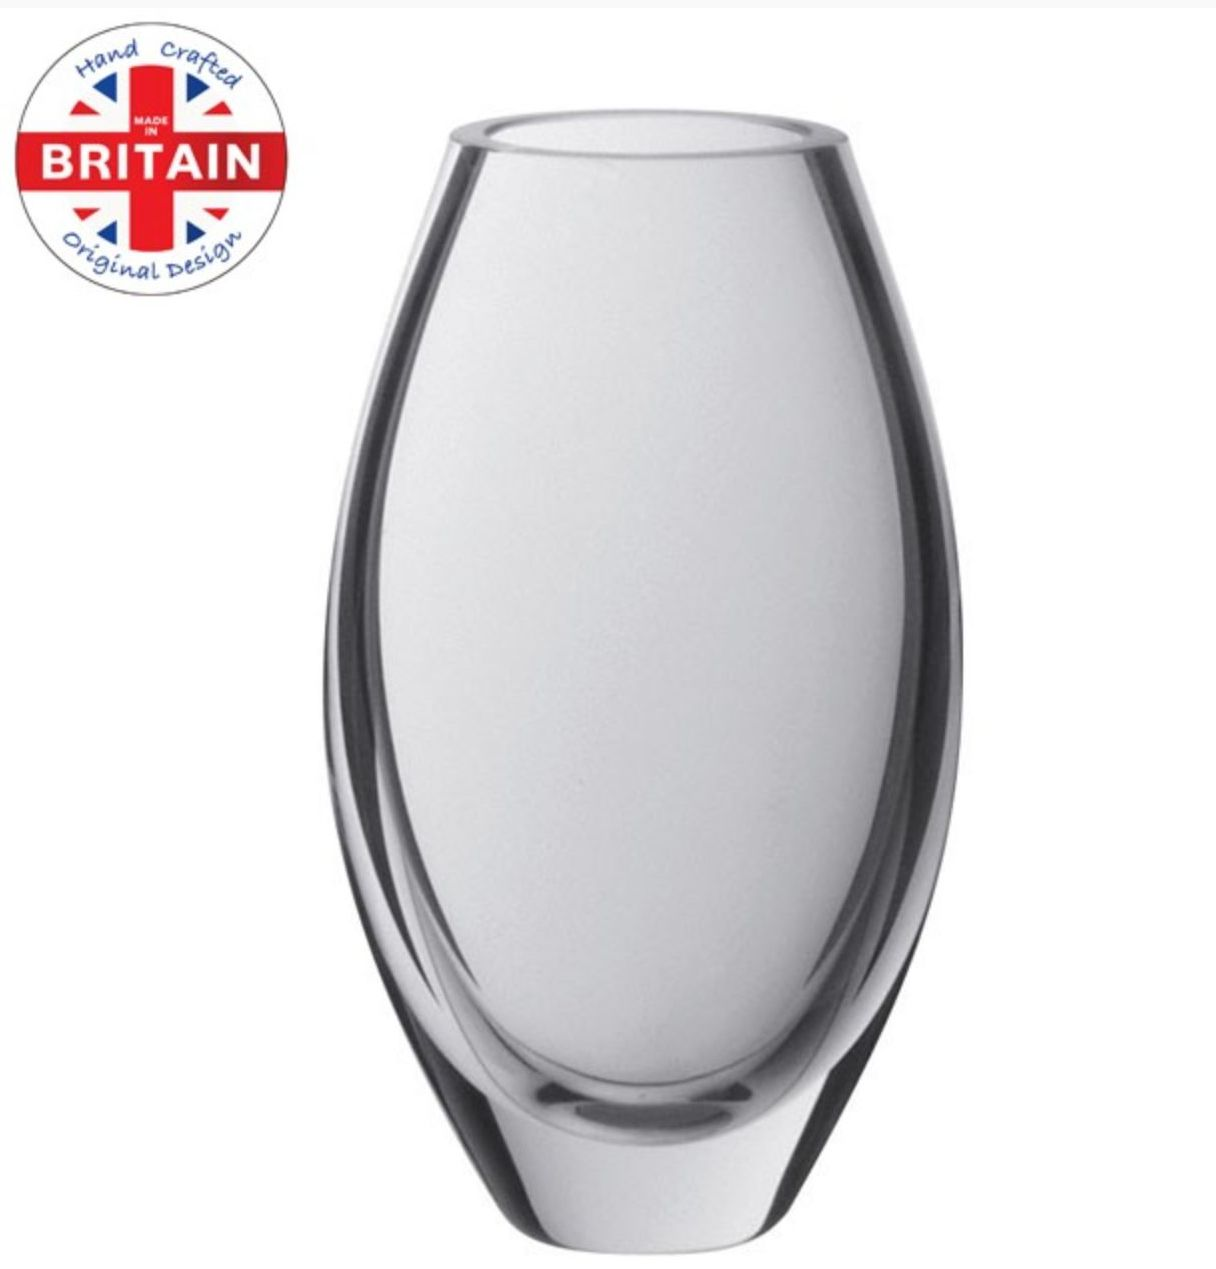 Dartington crystal product categories michael virden glass dartington opus small oval vase reviewsmspy